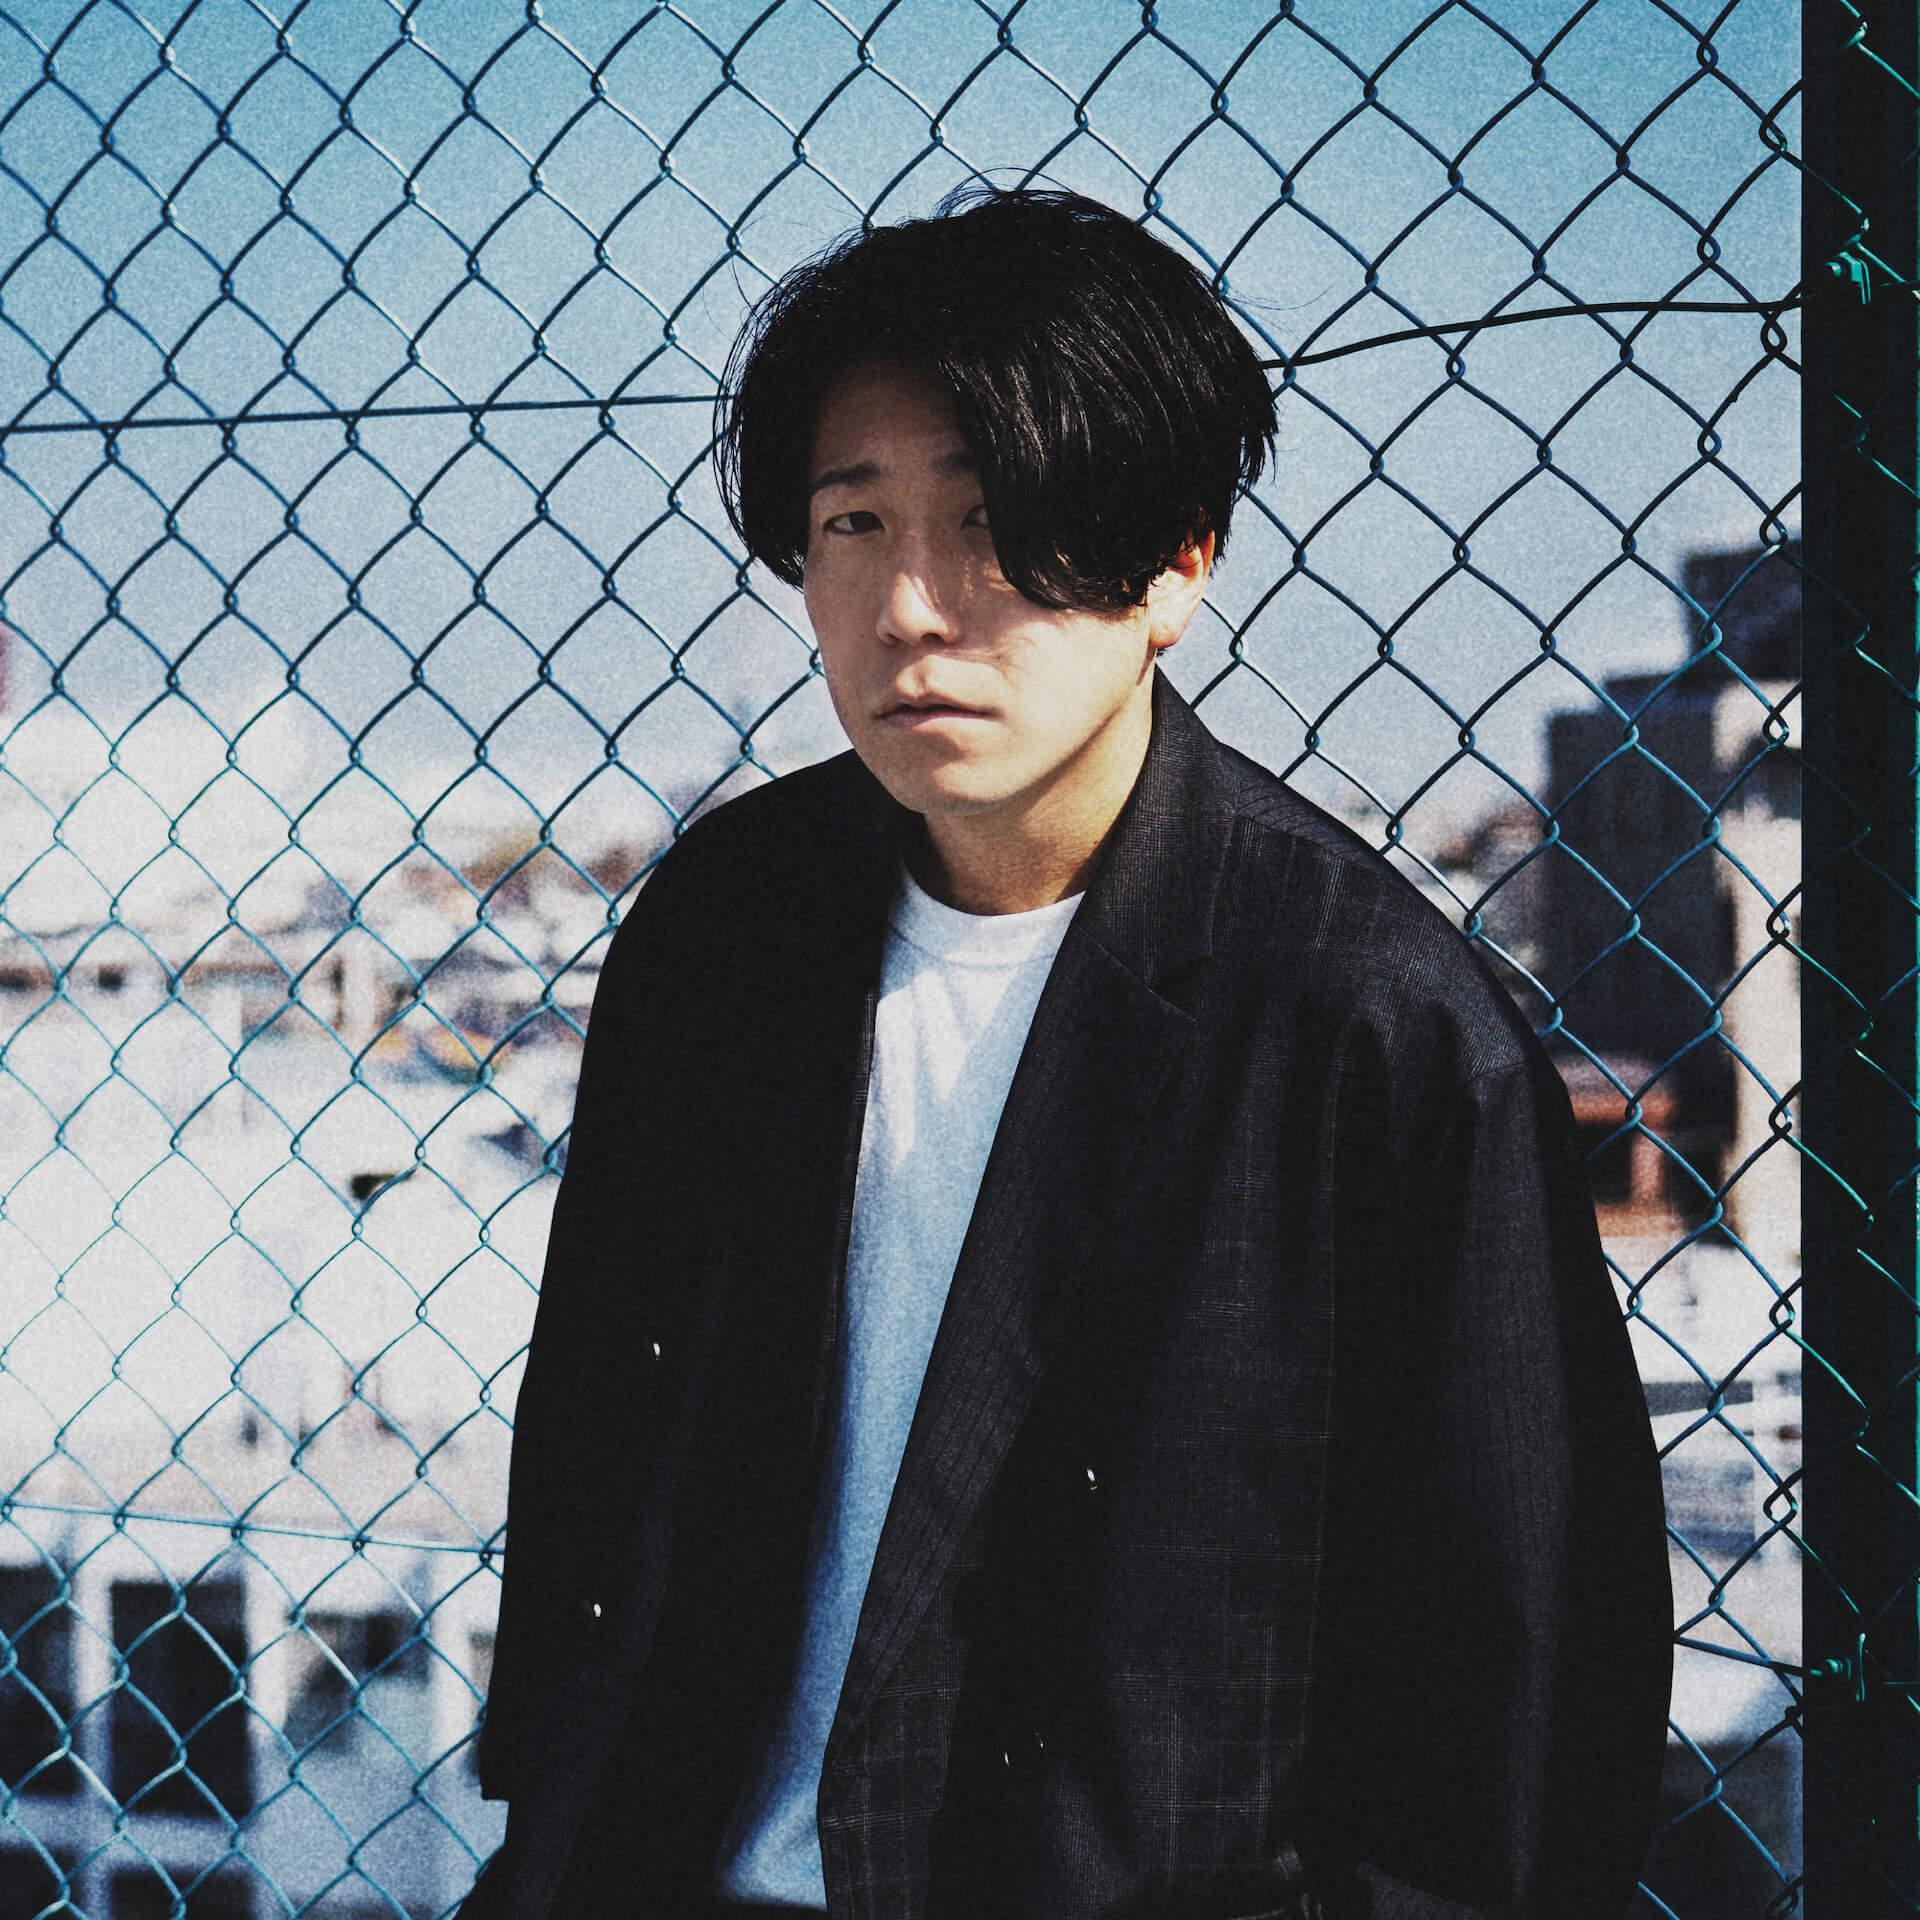 Kan Sano、Michael Kaneko、mabanuaらが出演する<origami SAI 2020 Tokyo>の配信チケットが発売決定!会場チケットの追加販売&Hiro-a-keyのゲスト出演も music210122_origamisai_4